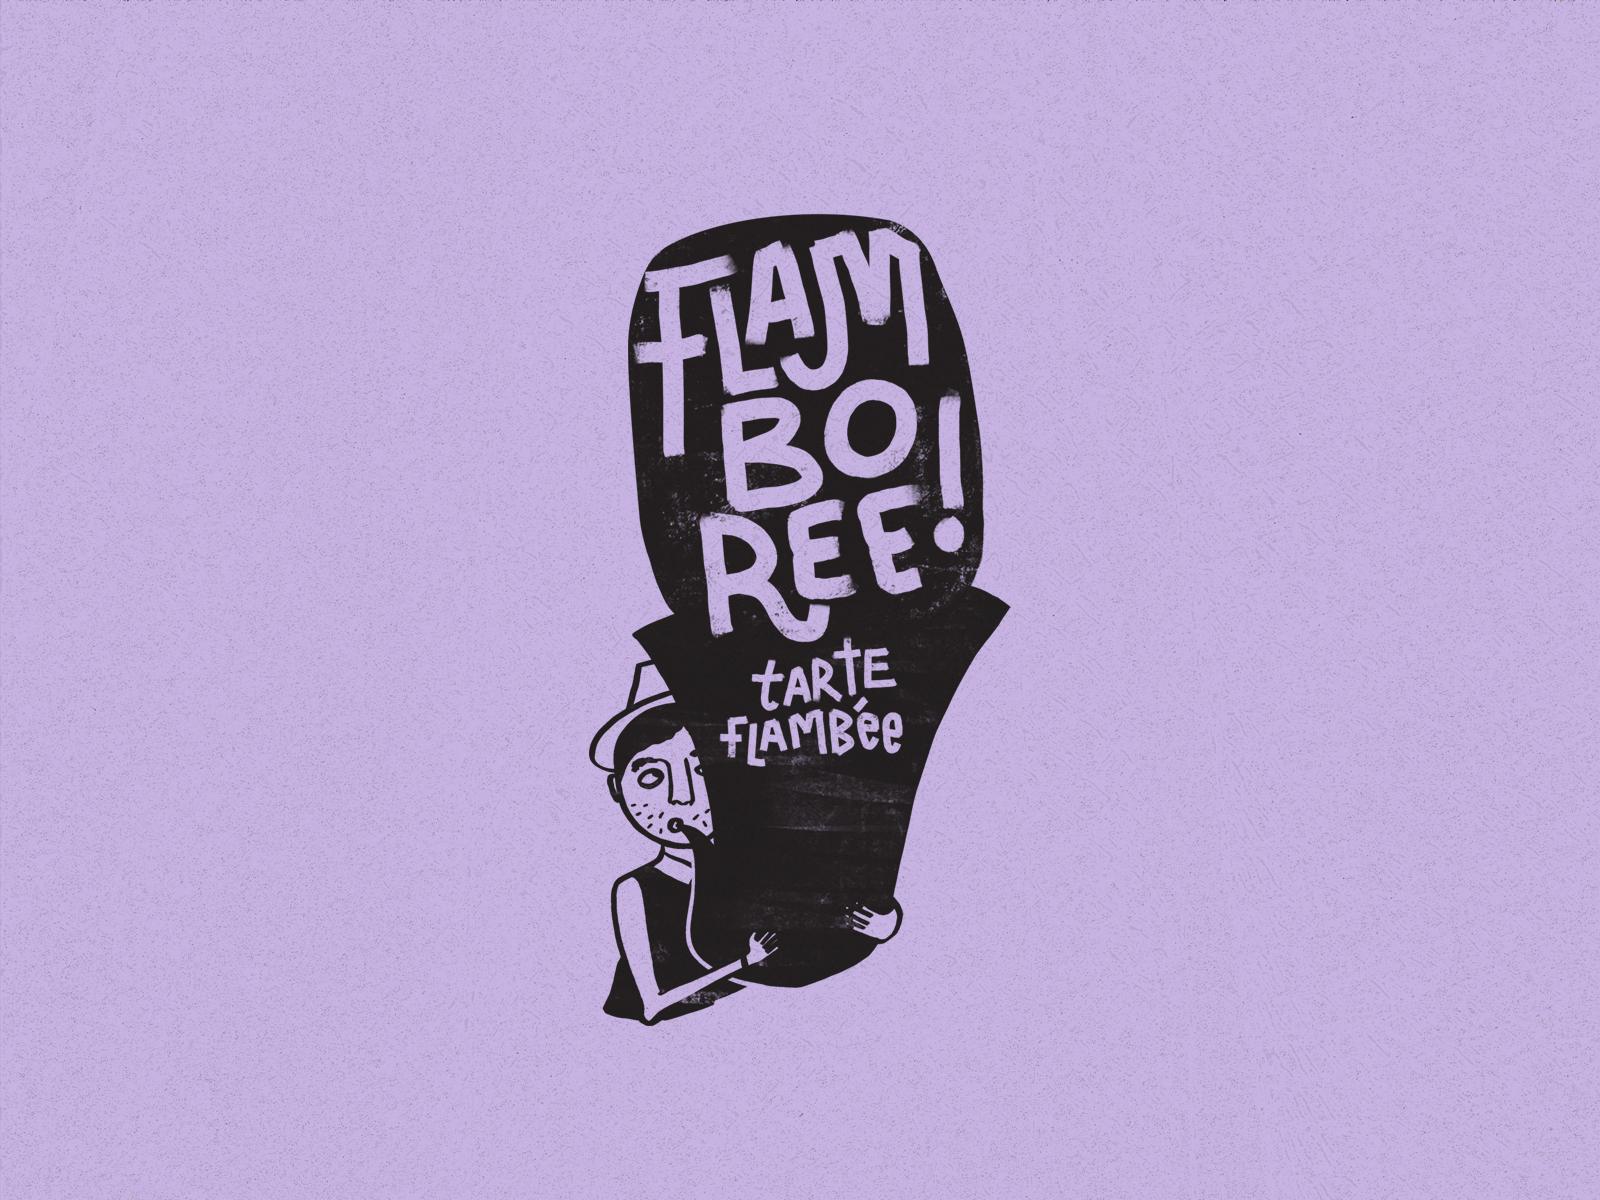 Saint dribble flamboree illustrations logo